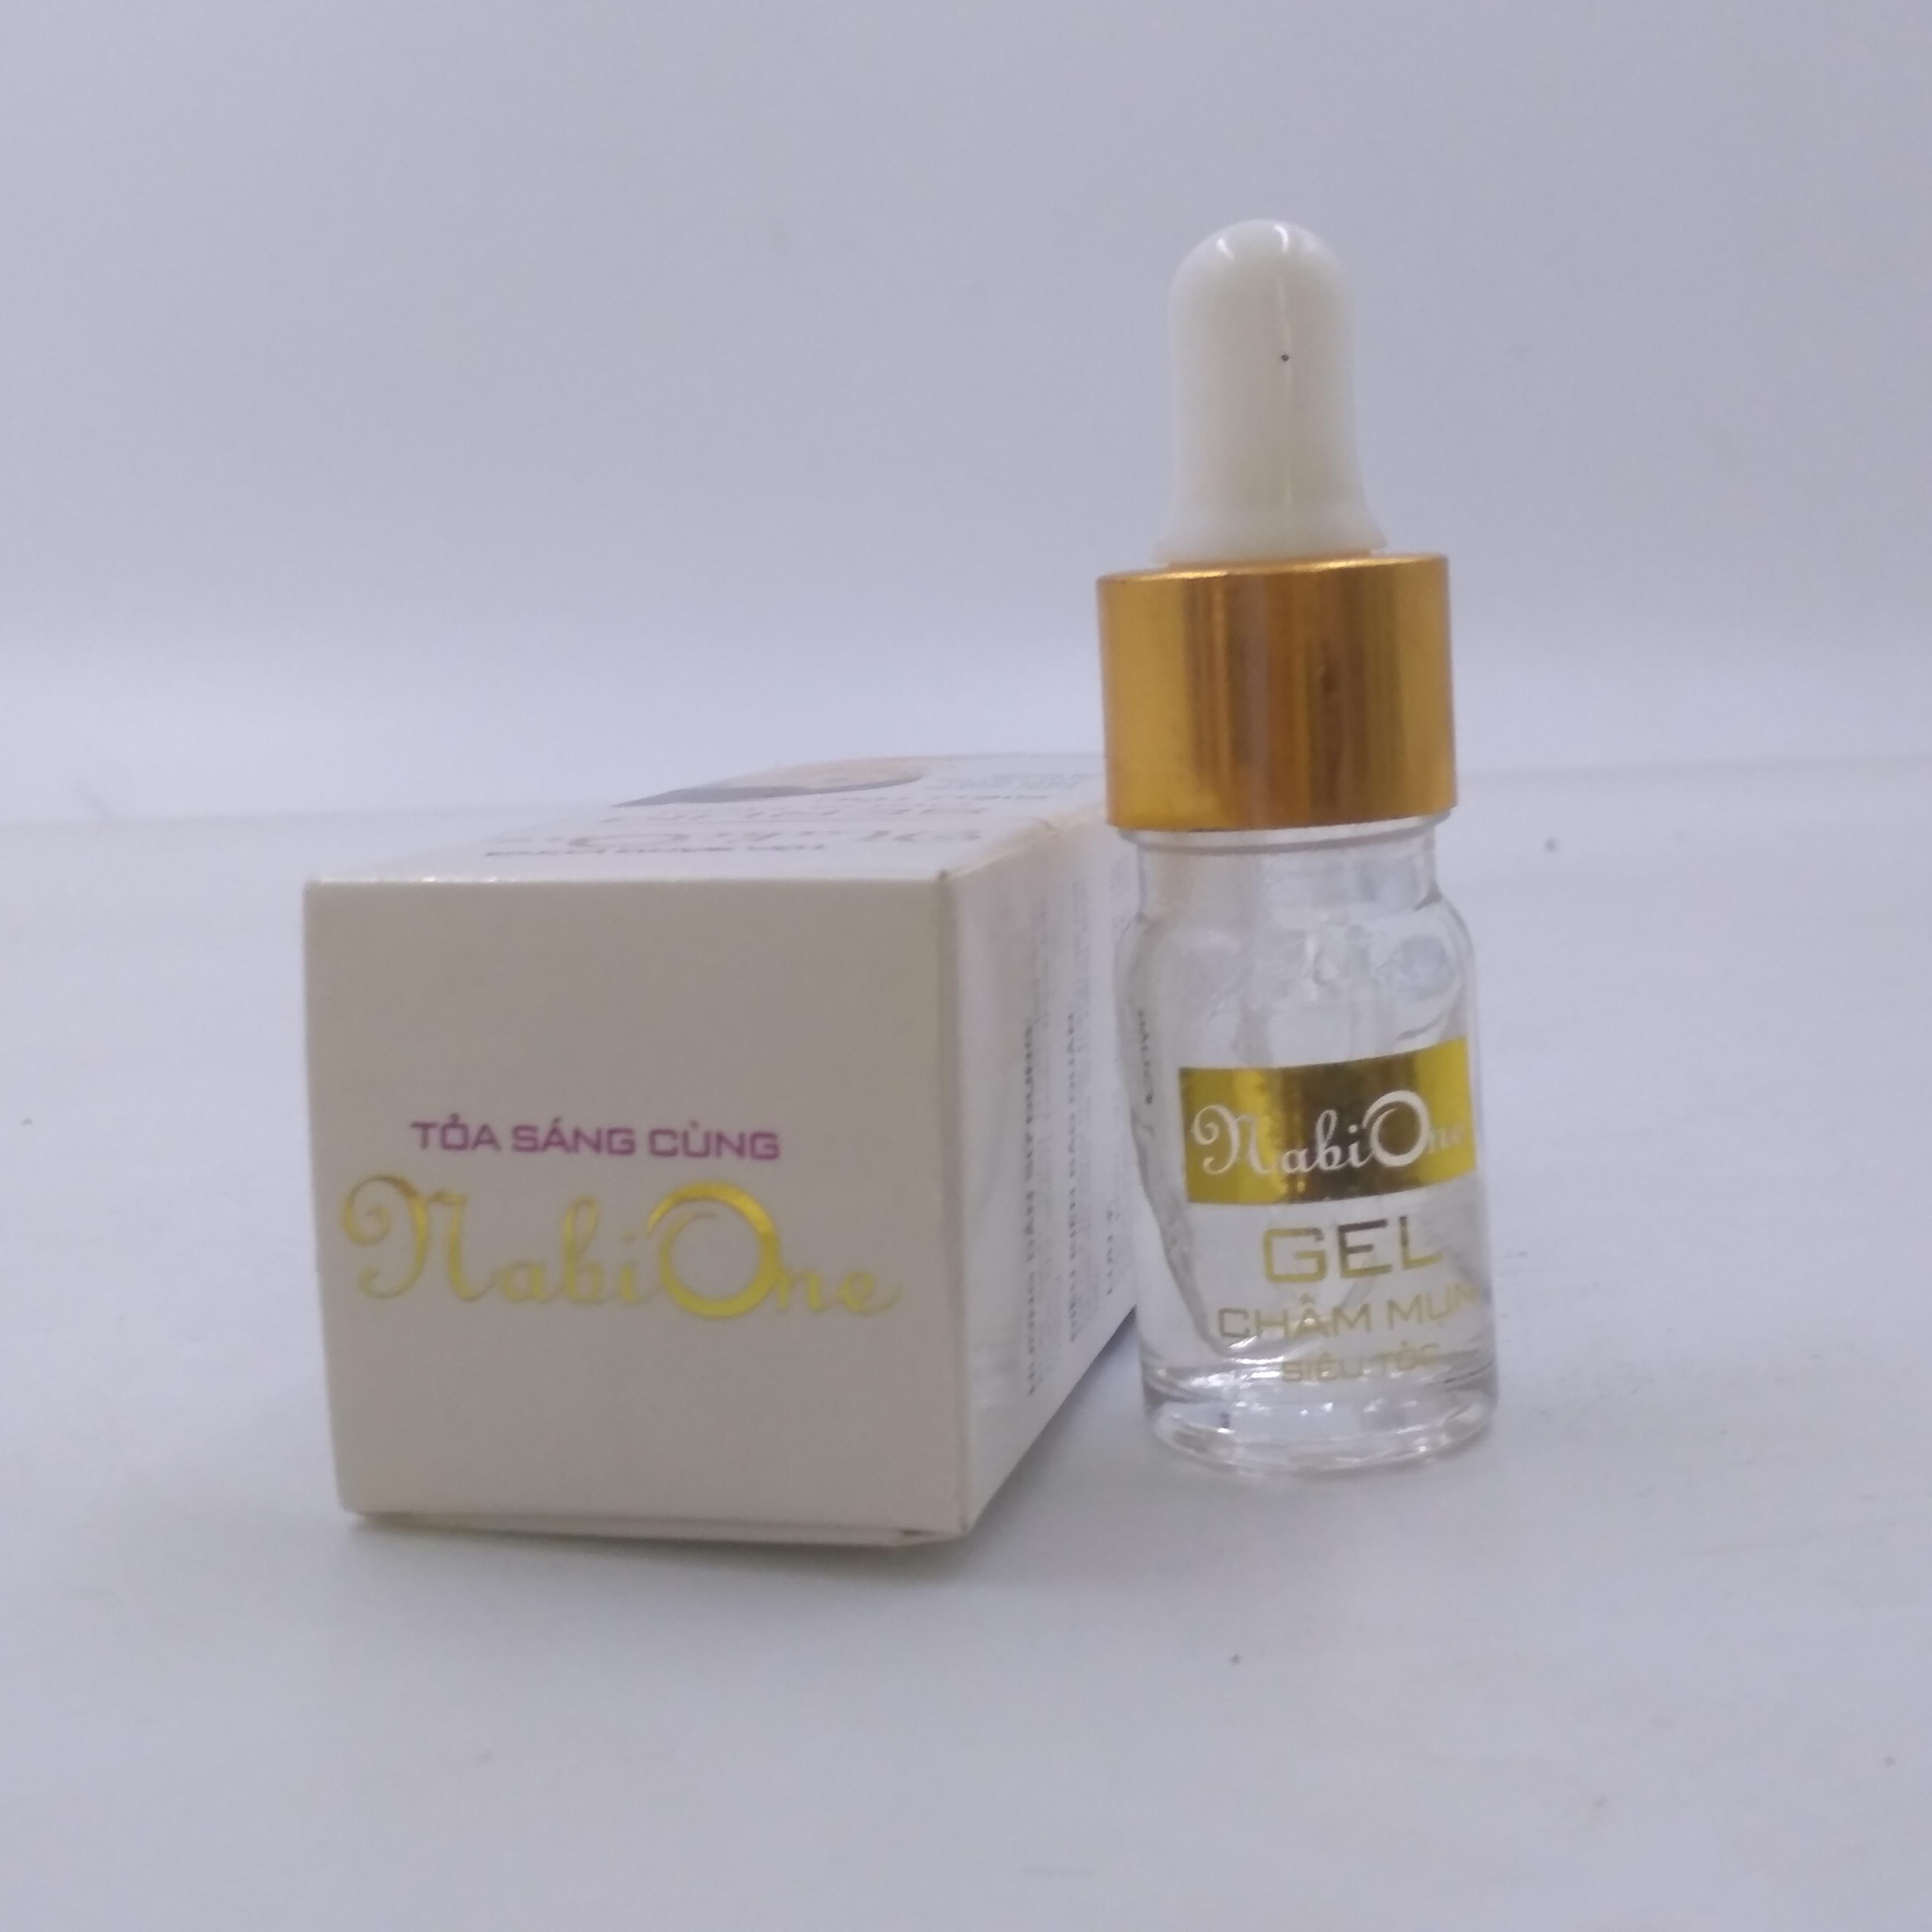 Serum ngừa mụn 15ml (Trắng)